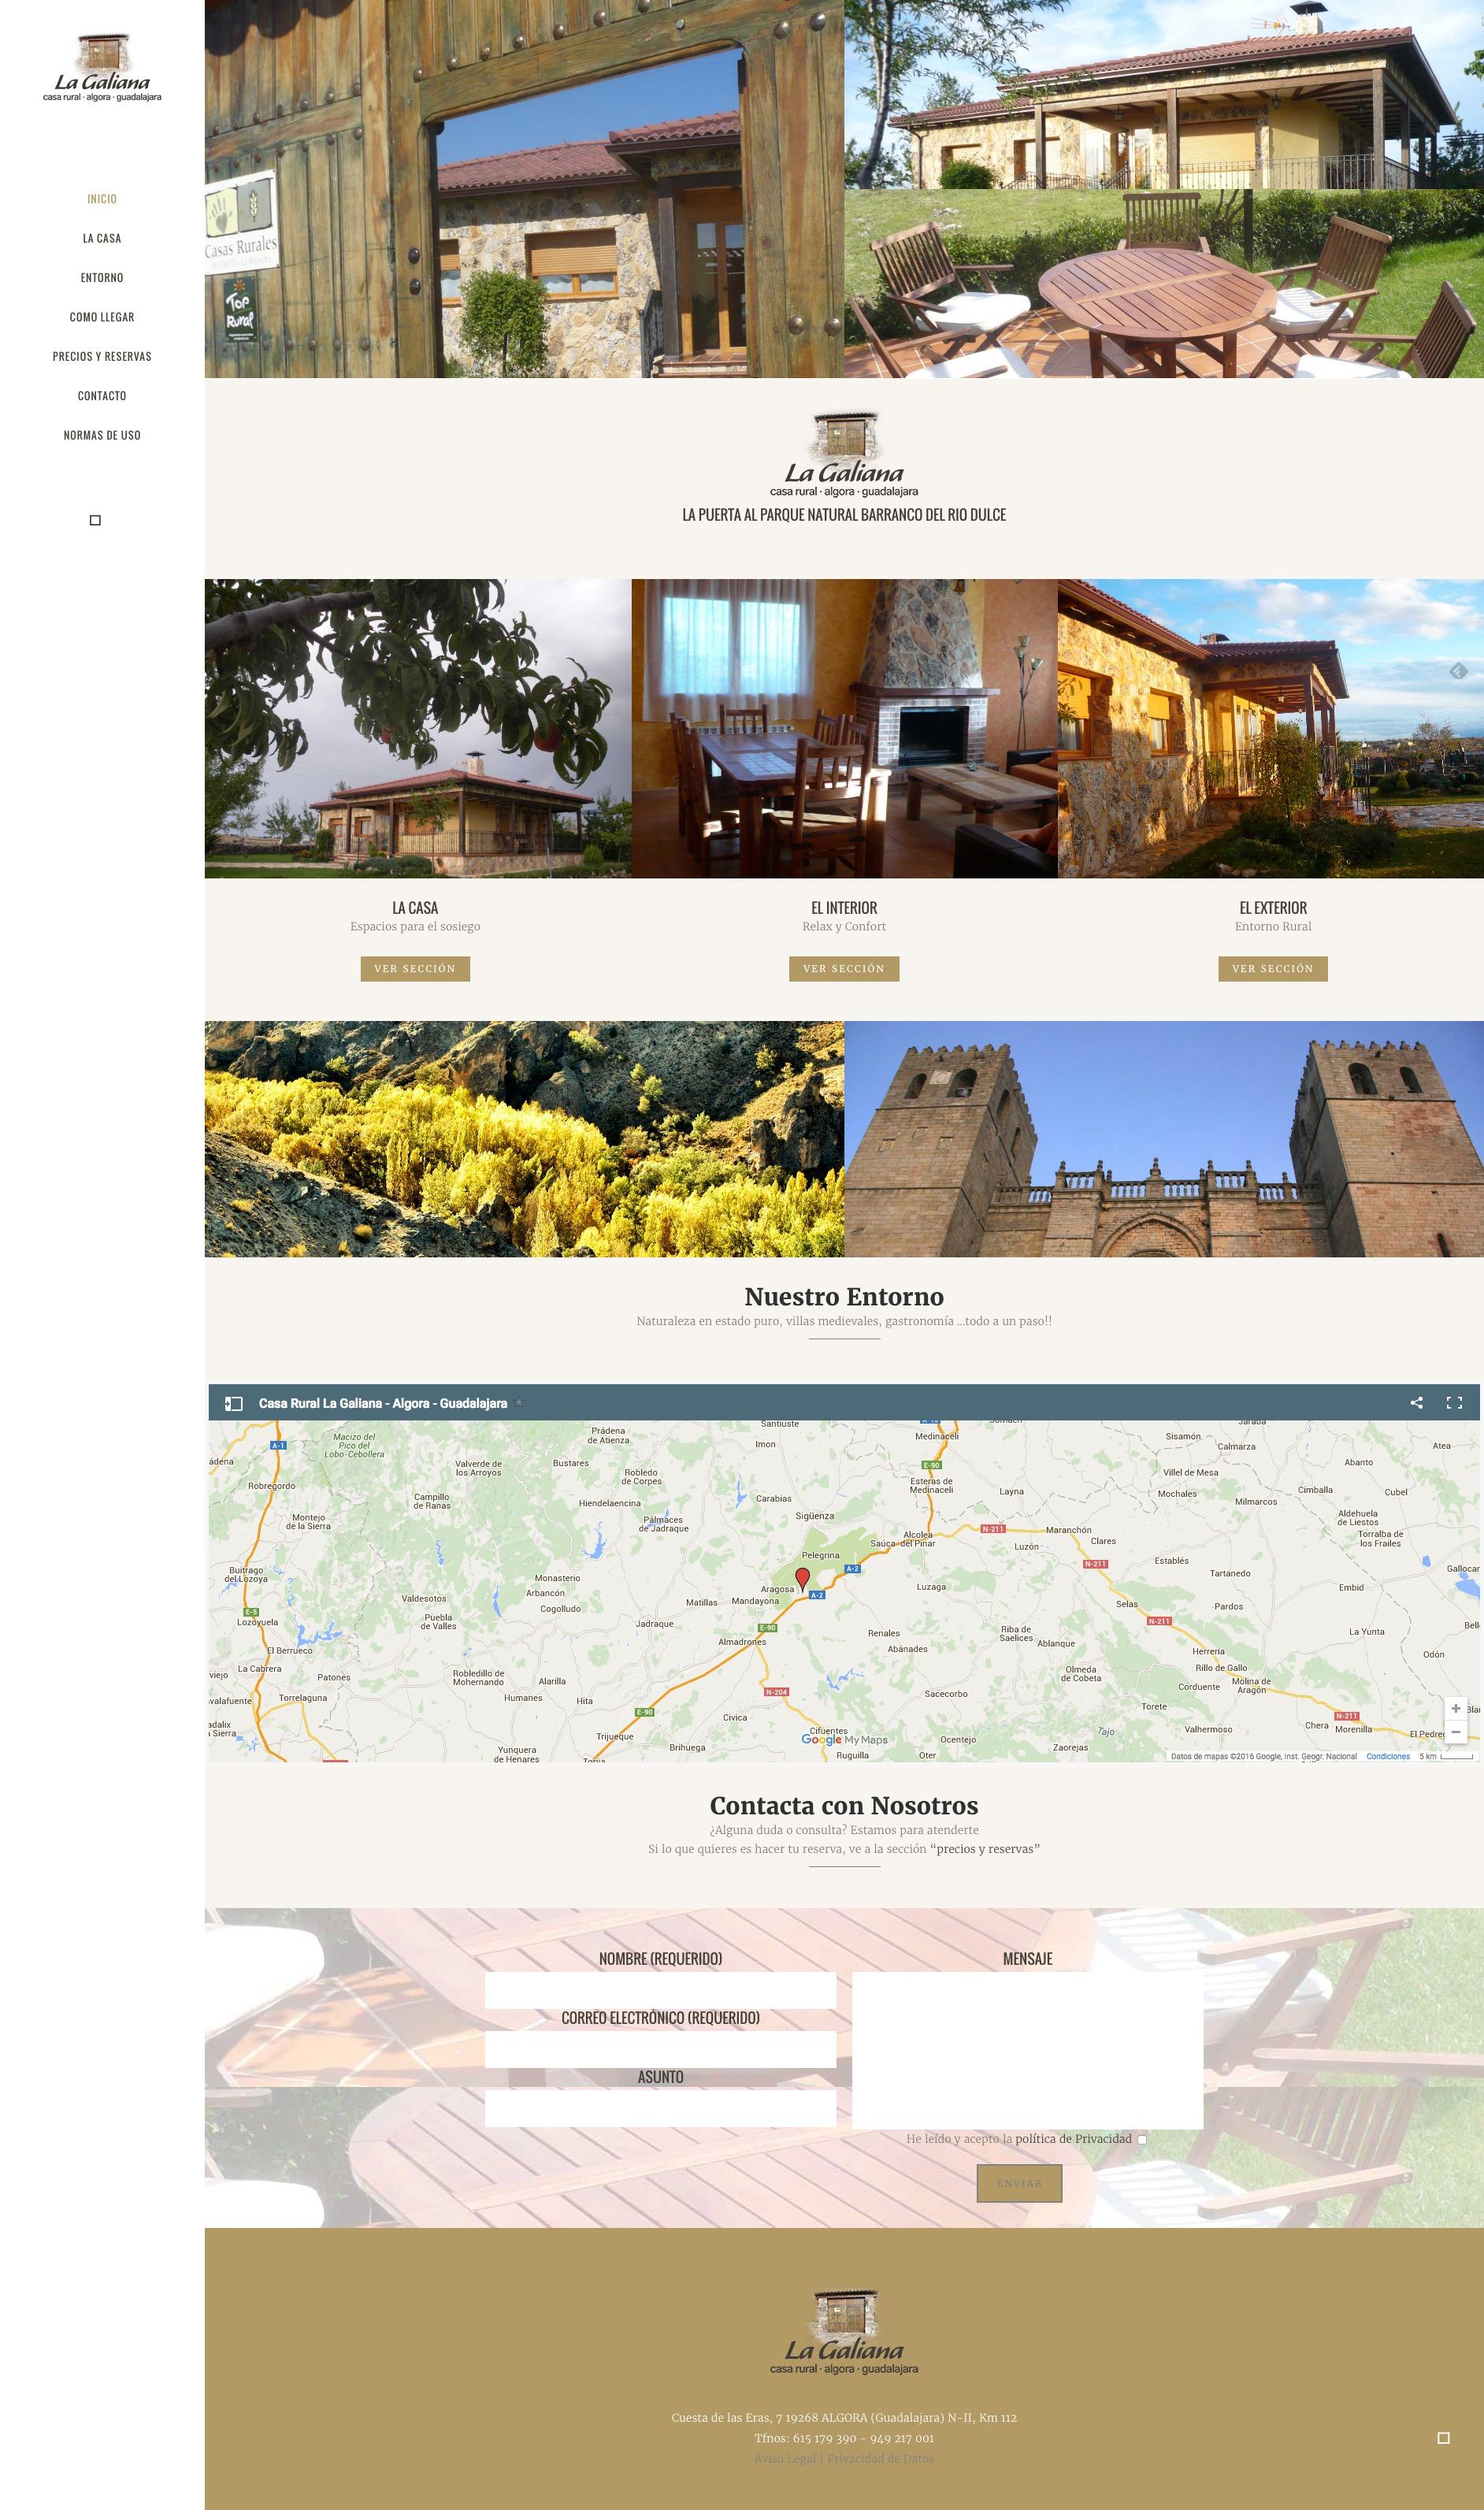 Casa rural La Galiana web completa